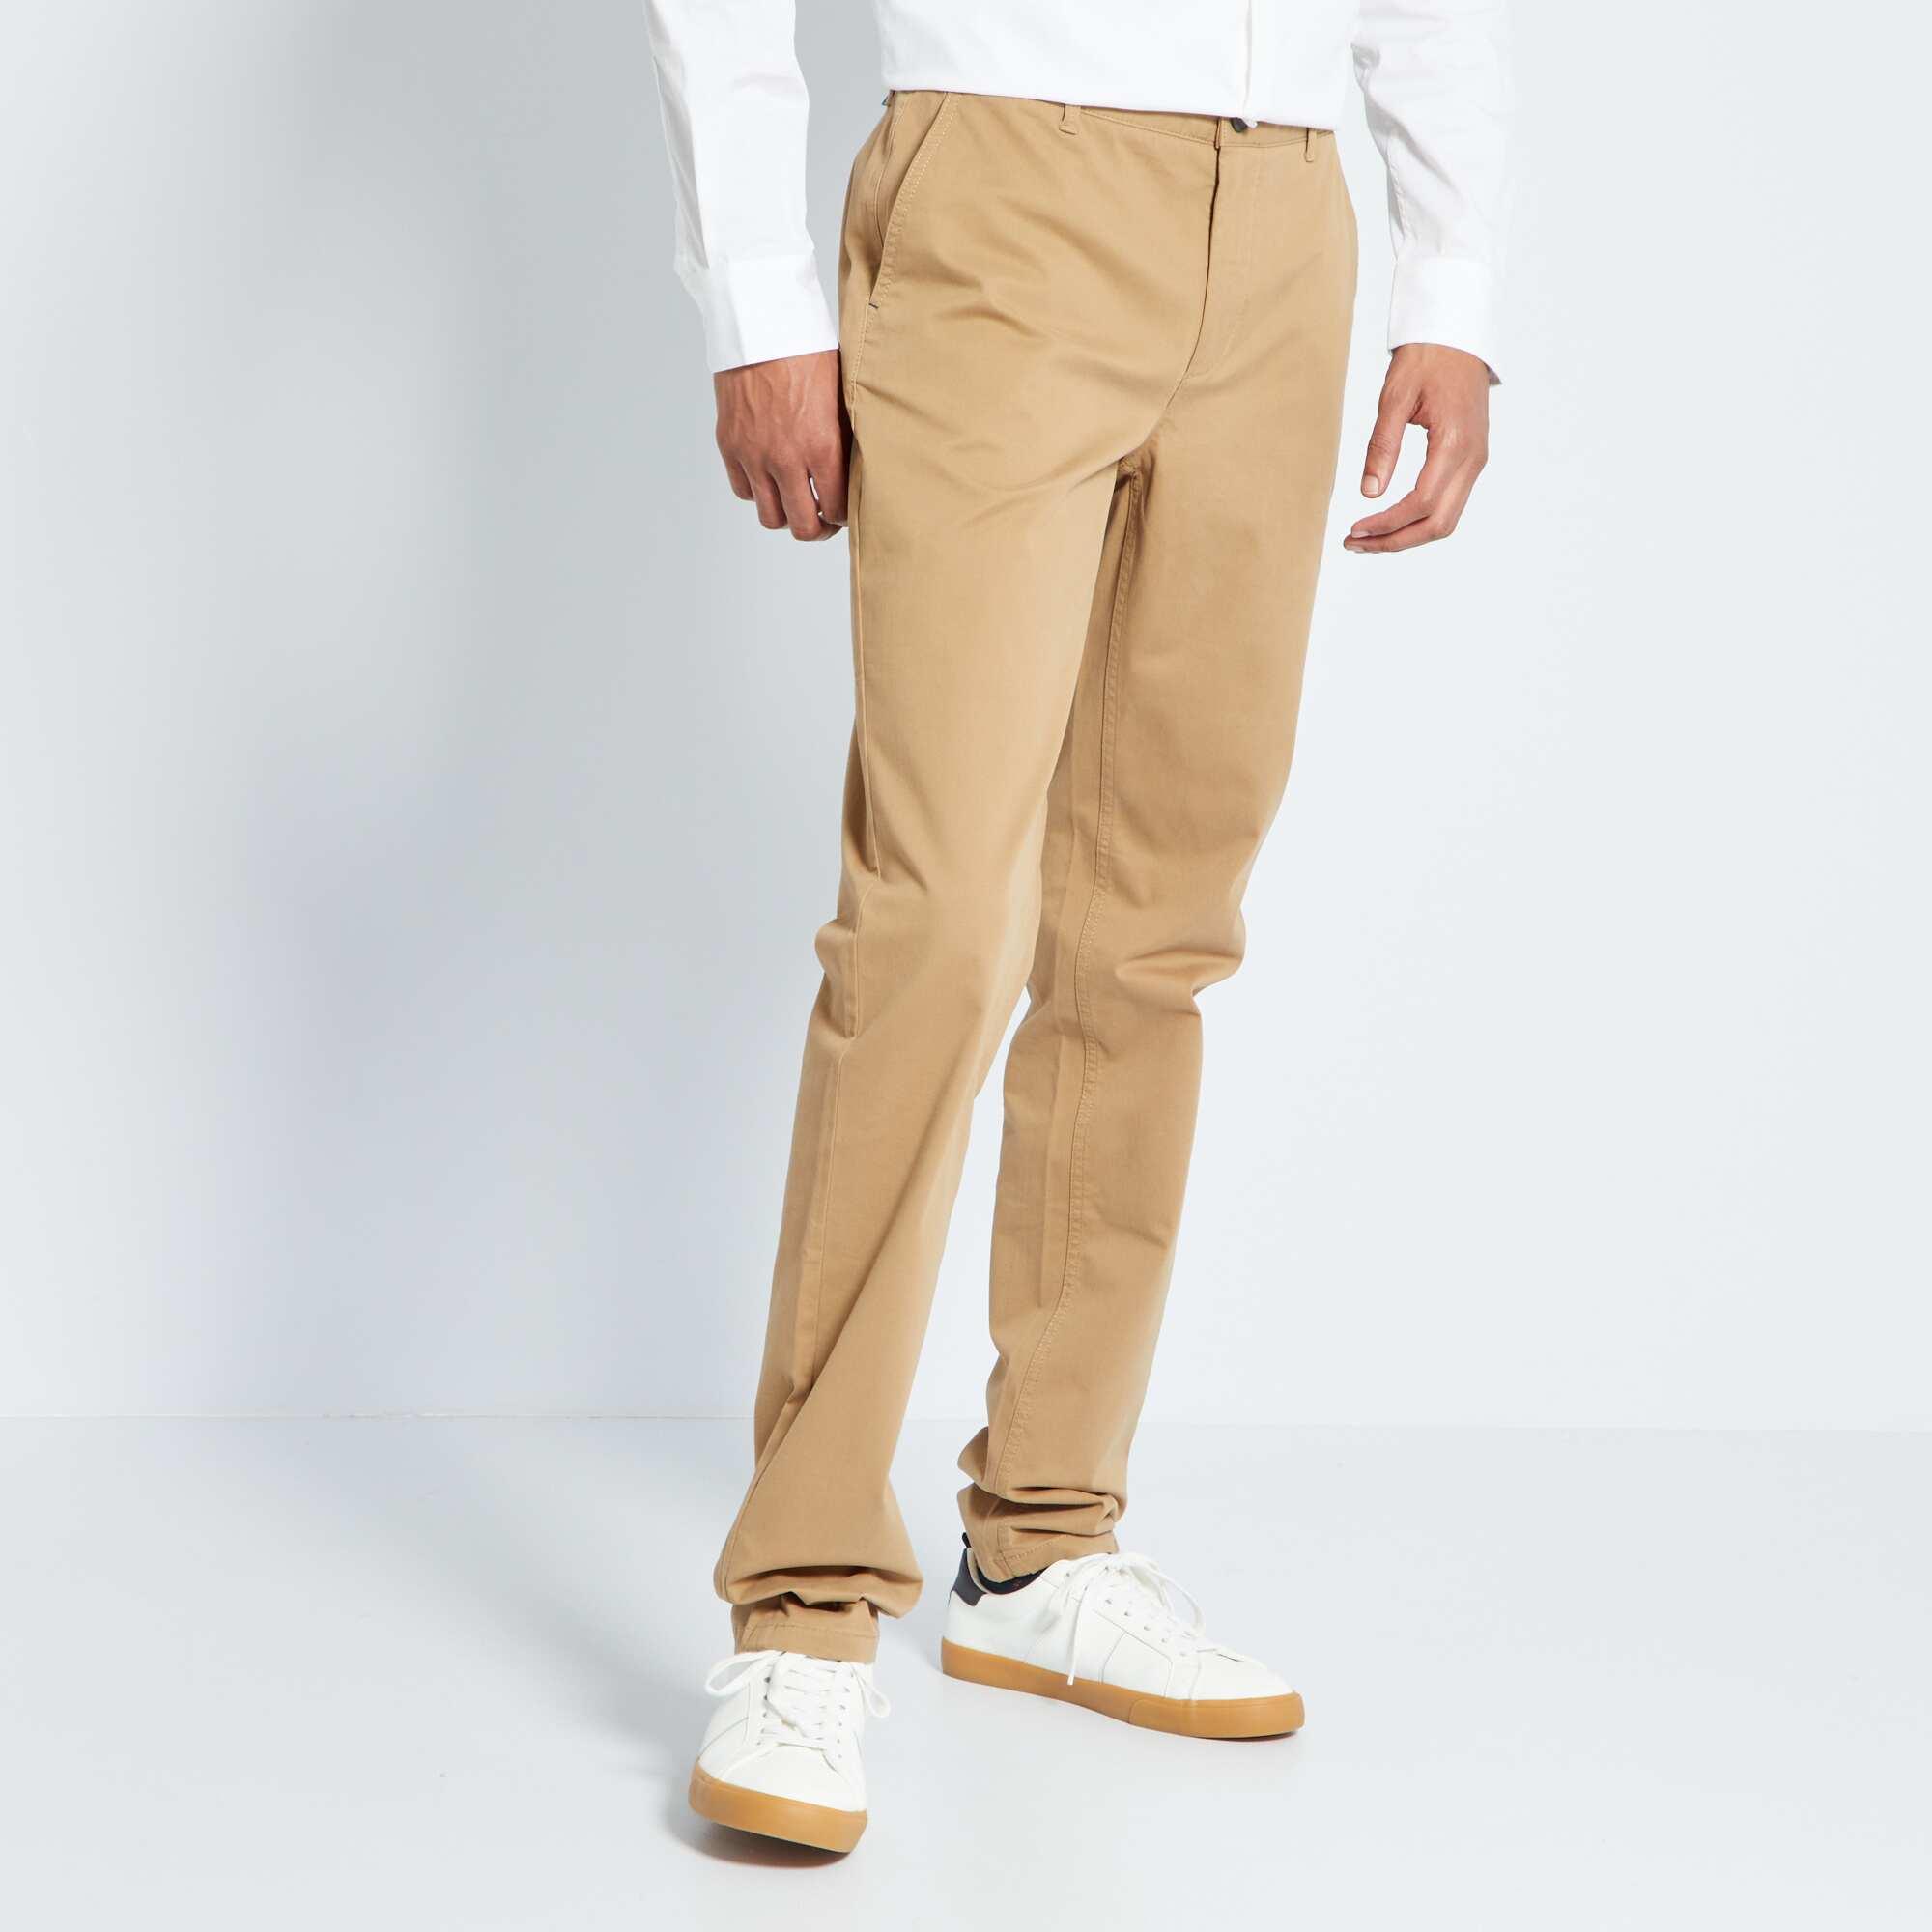 pantalon chino slim pur coton l38 1m90 homme beige kiabi 22 00. Black Bedroom Furniture Sets. Home Design Ideas